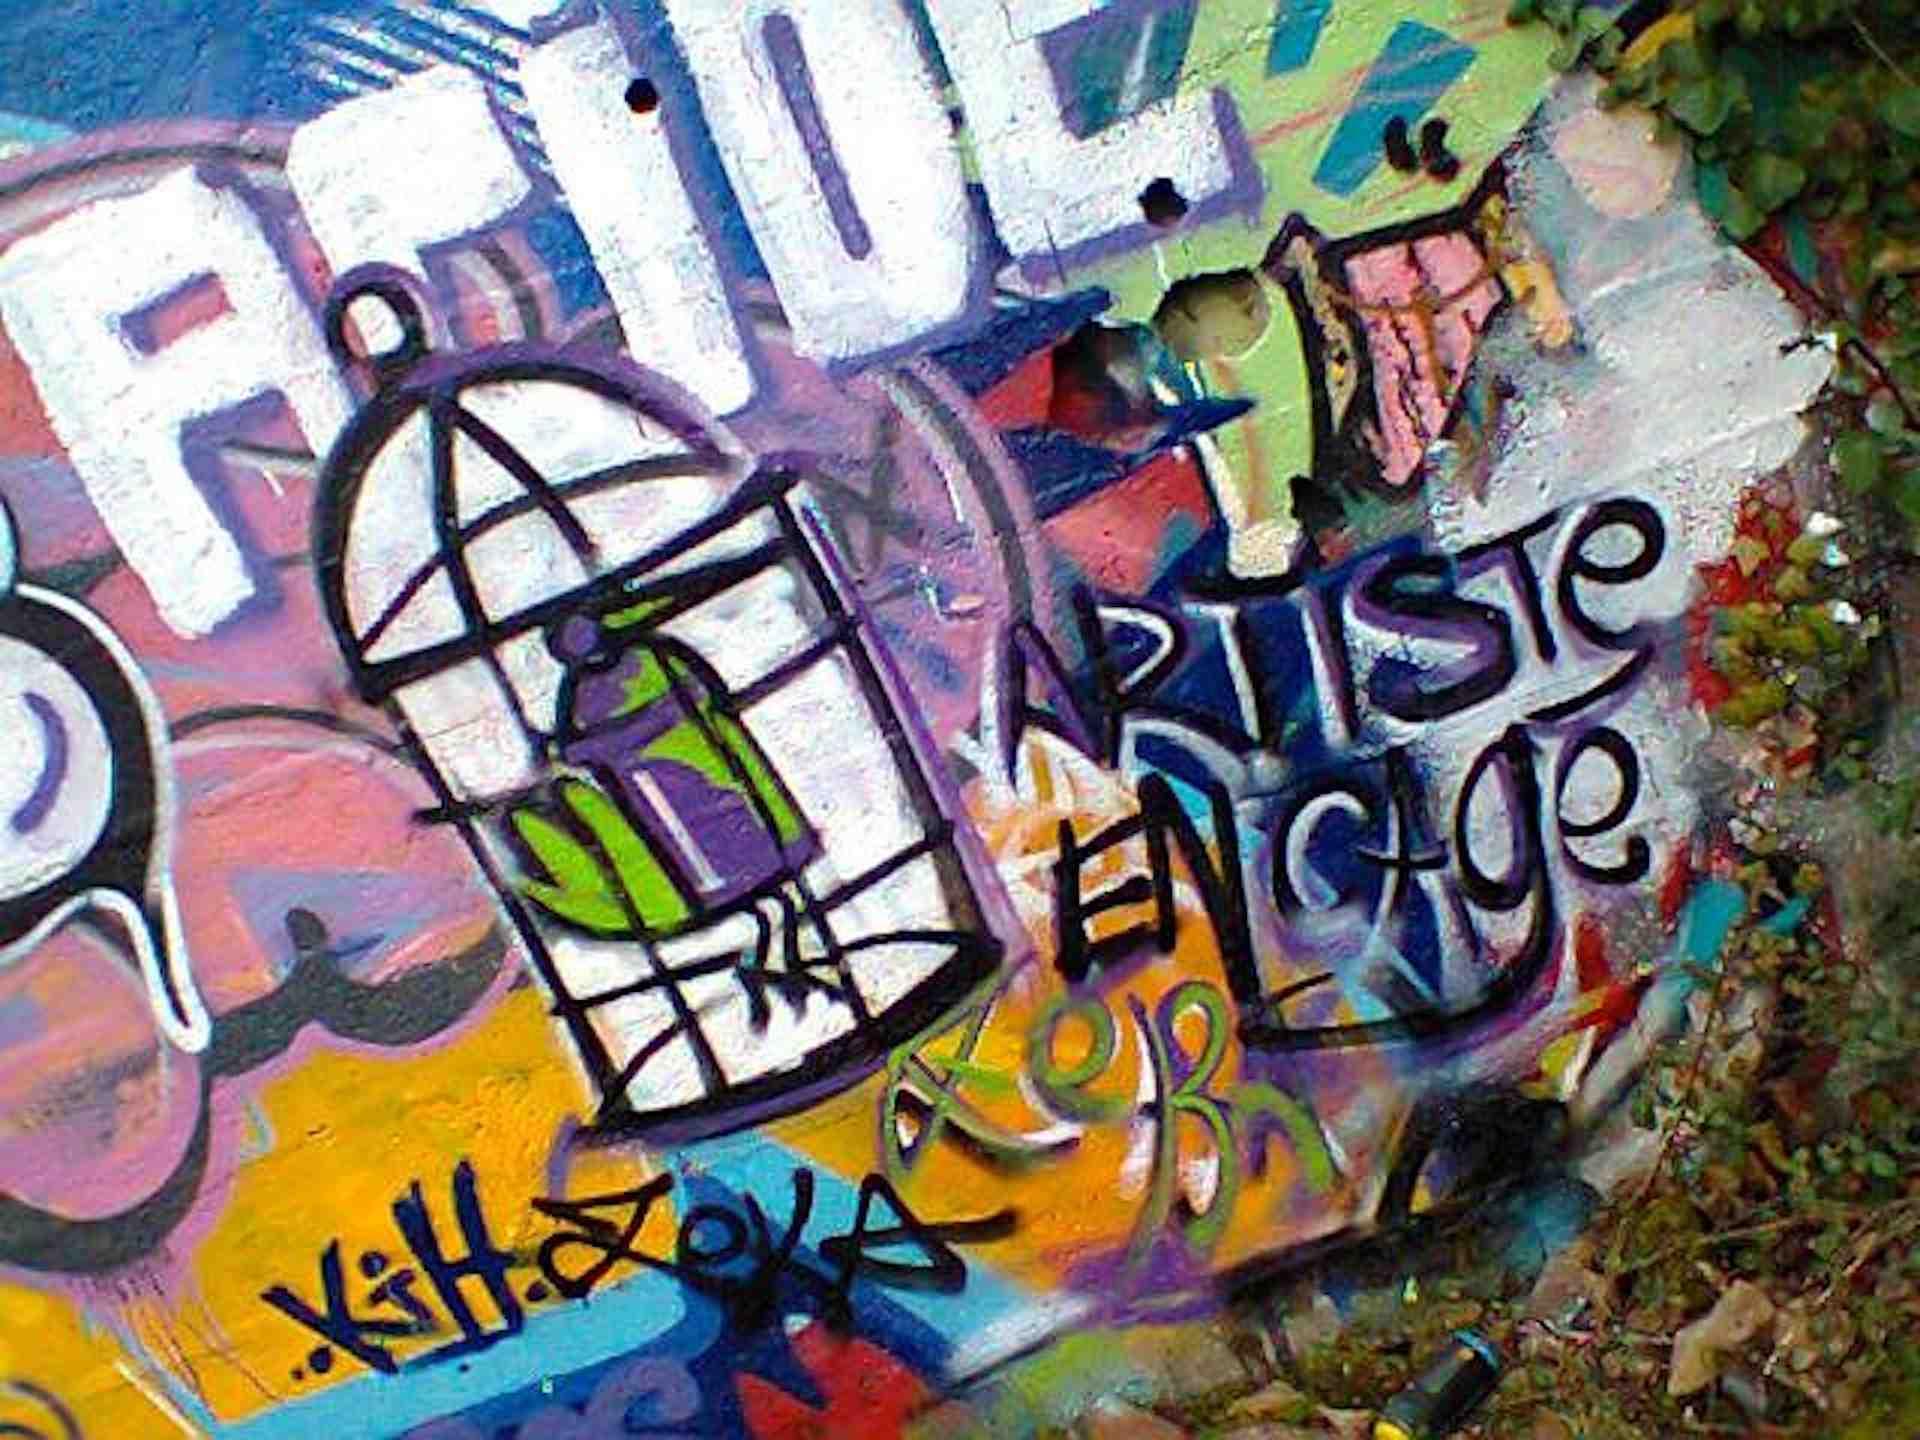 graffiti carrière misery à Nantes